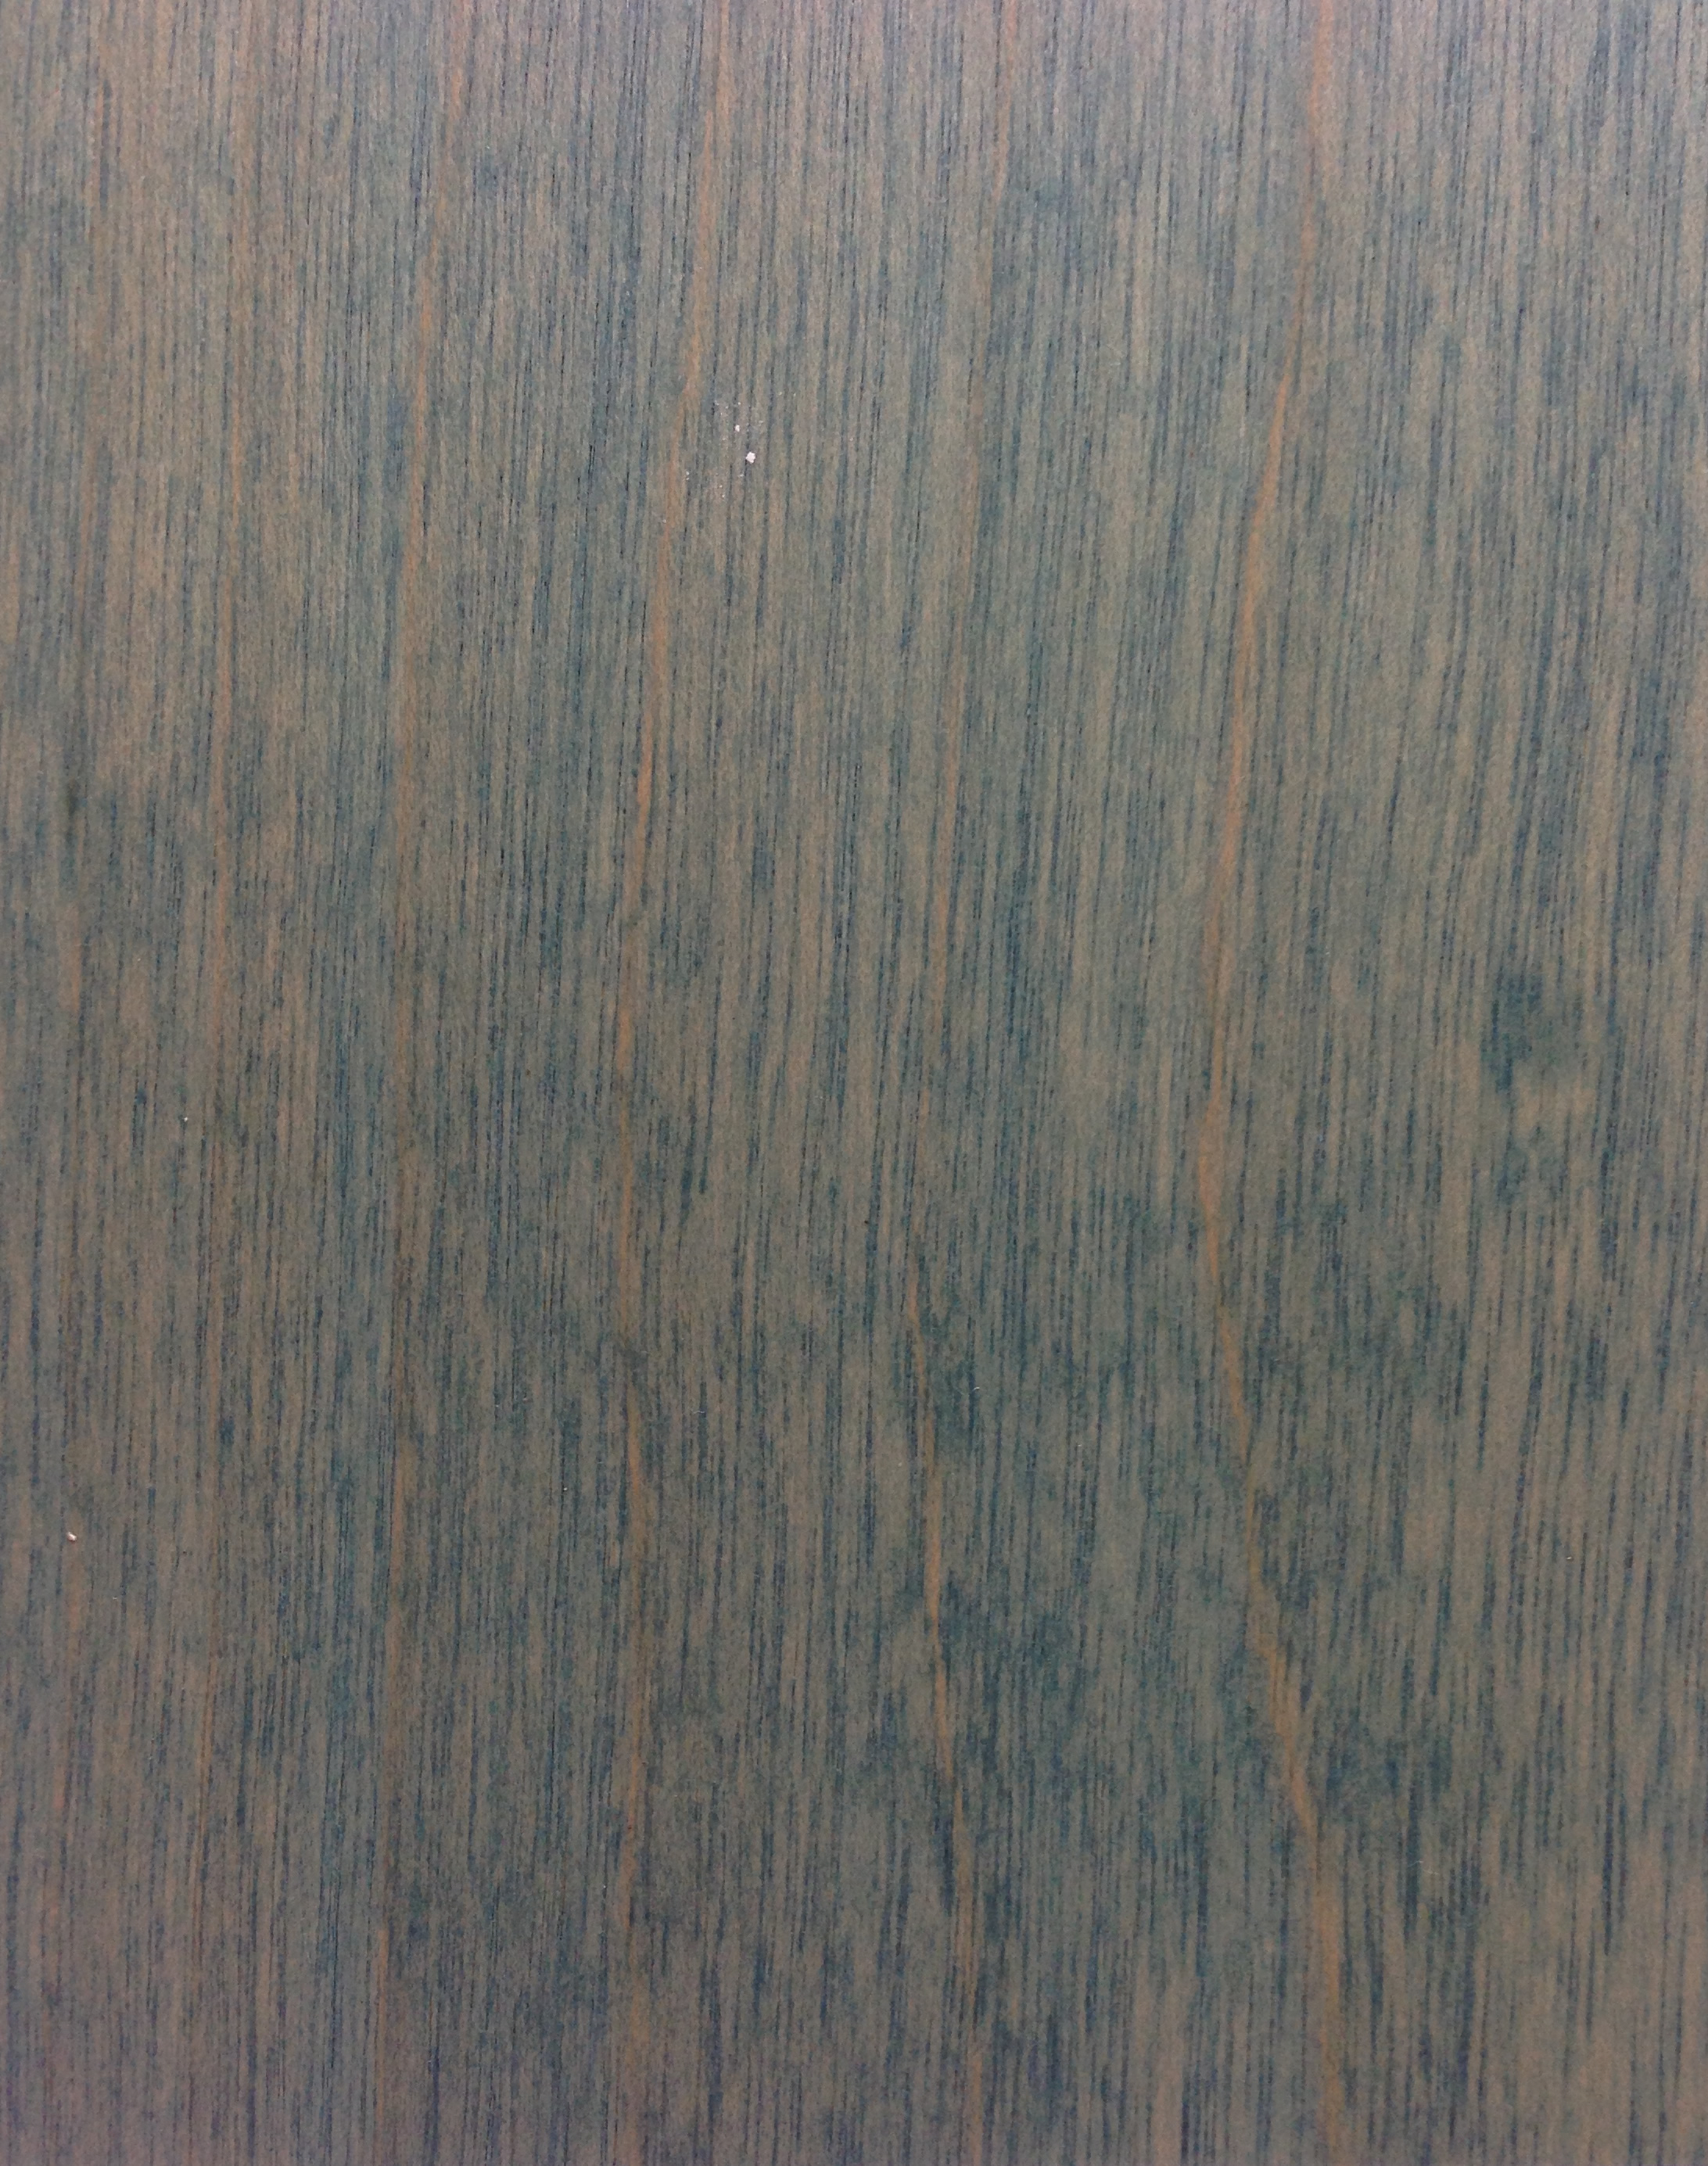 white-birch-fc-120208_8354501741_o